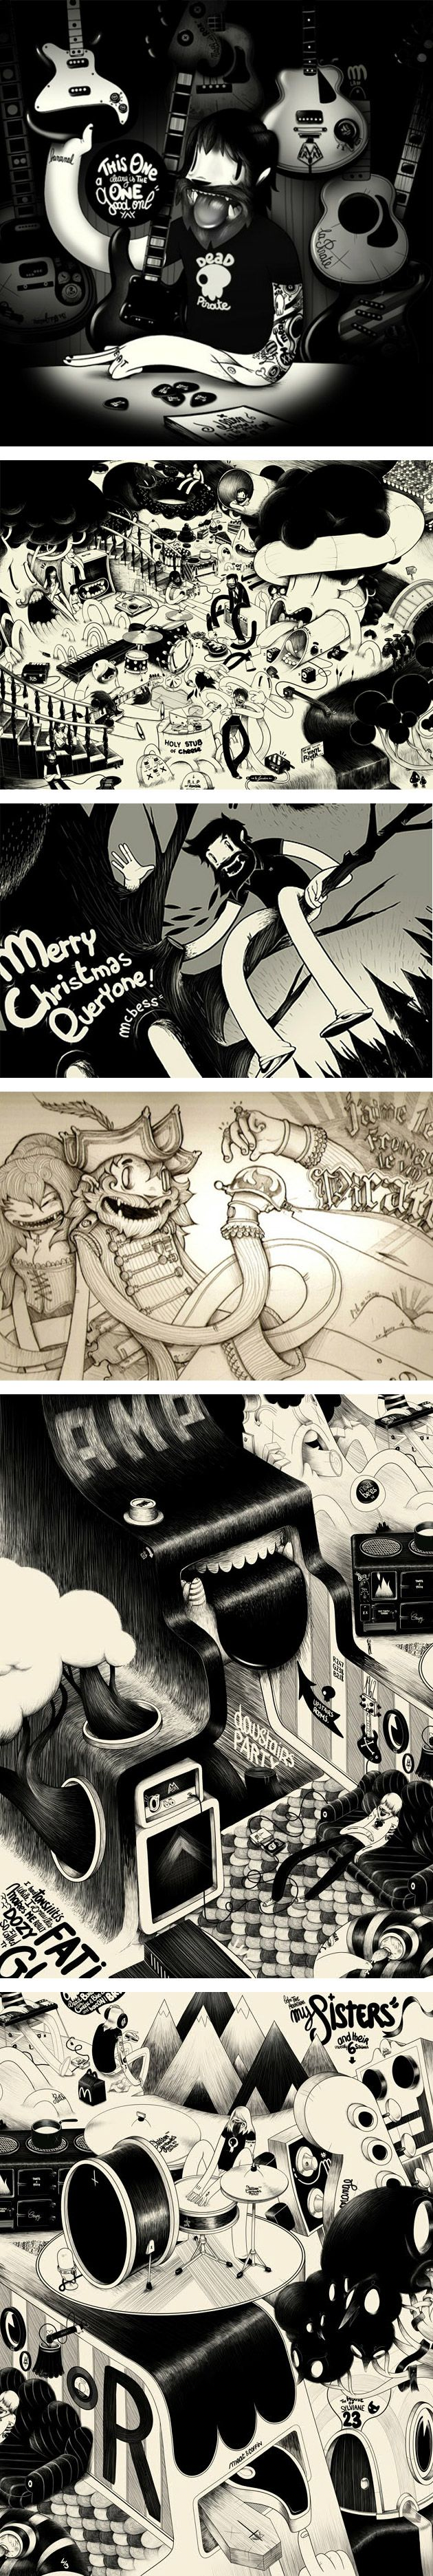 McBess illustrations !! I love it